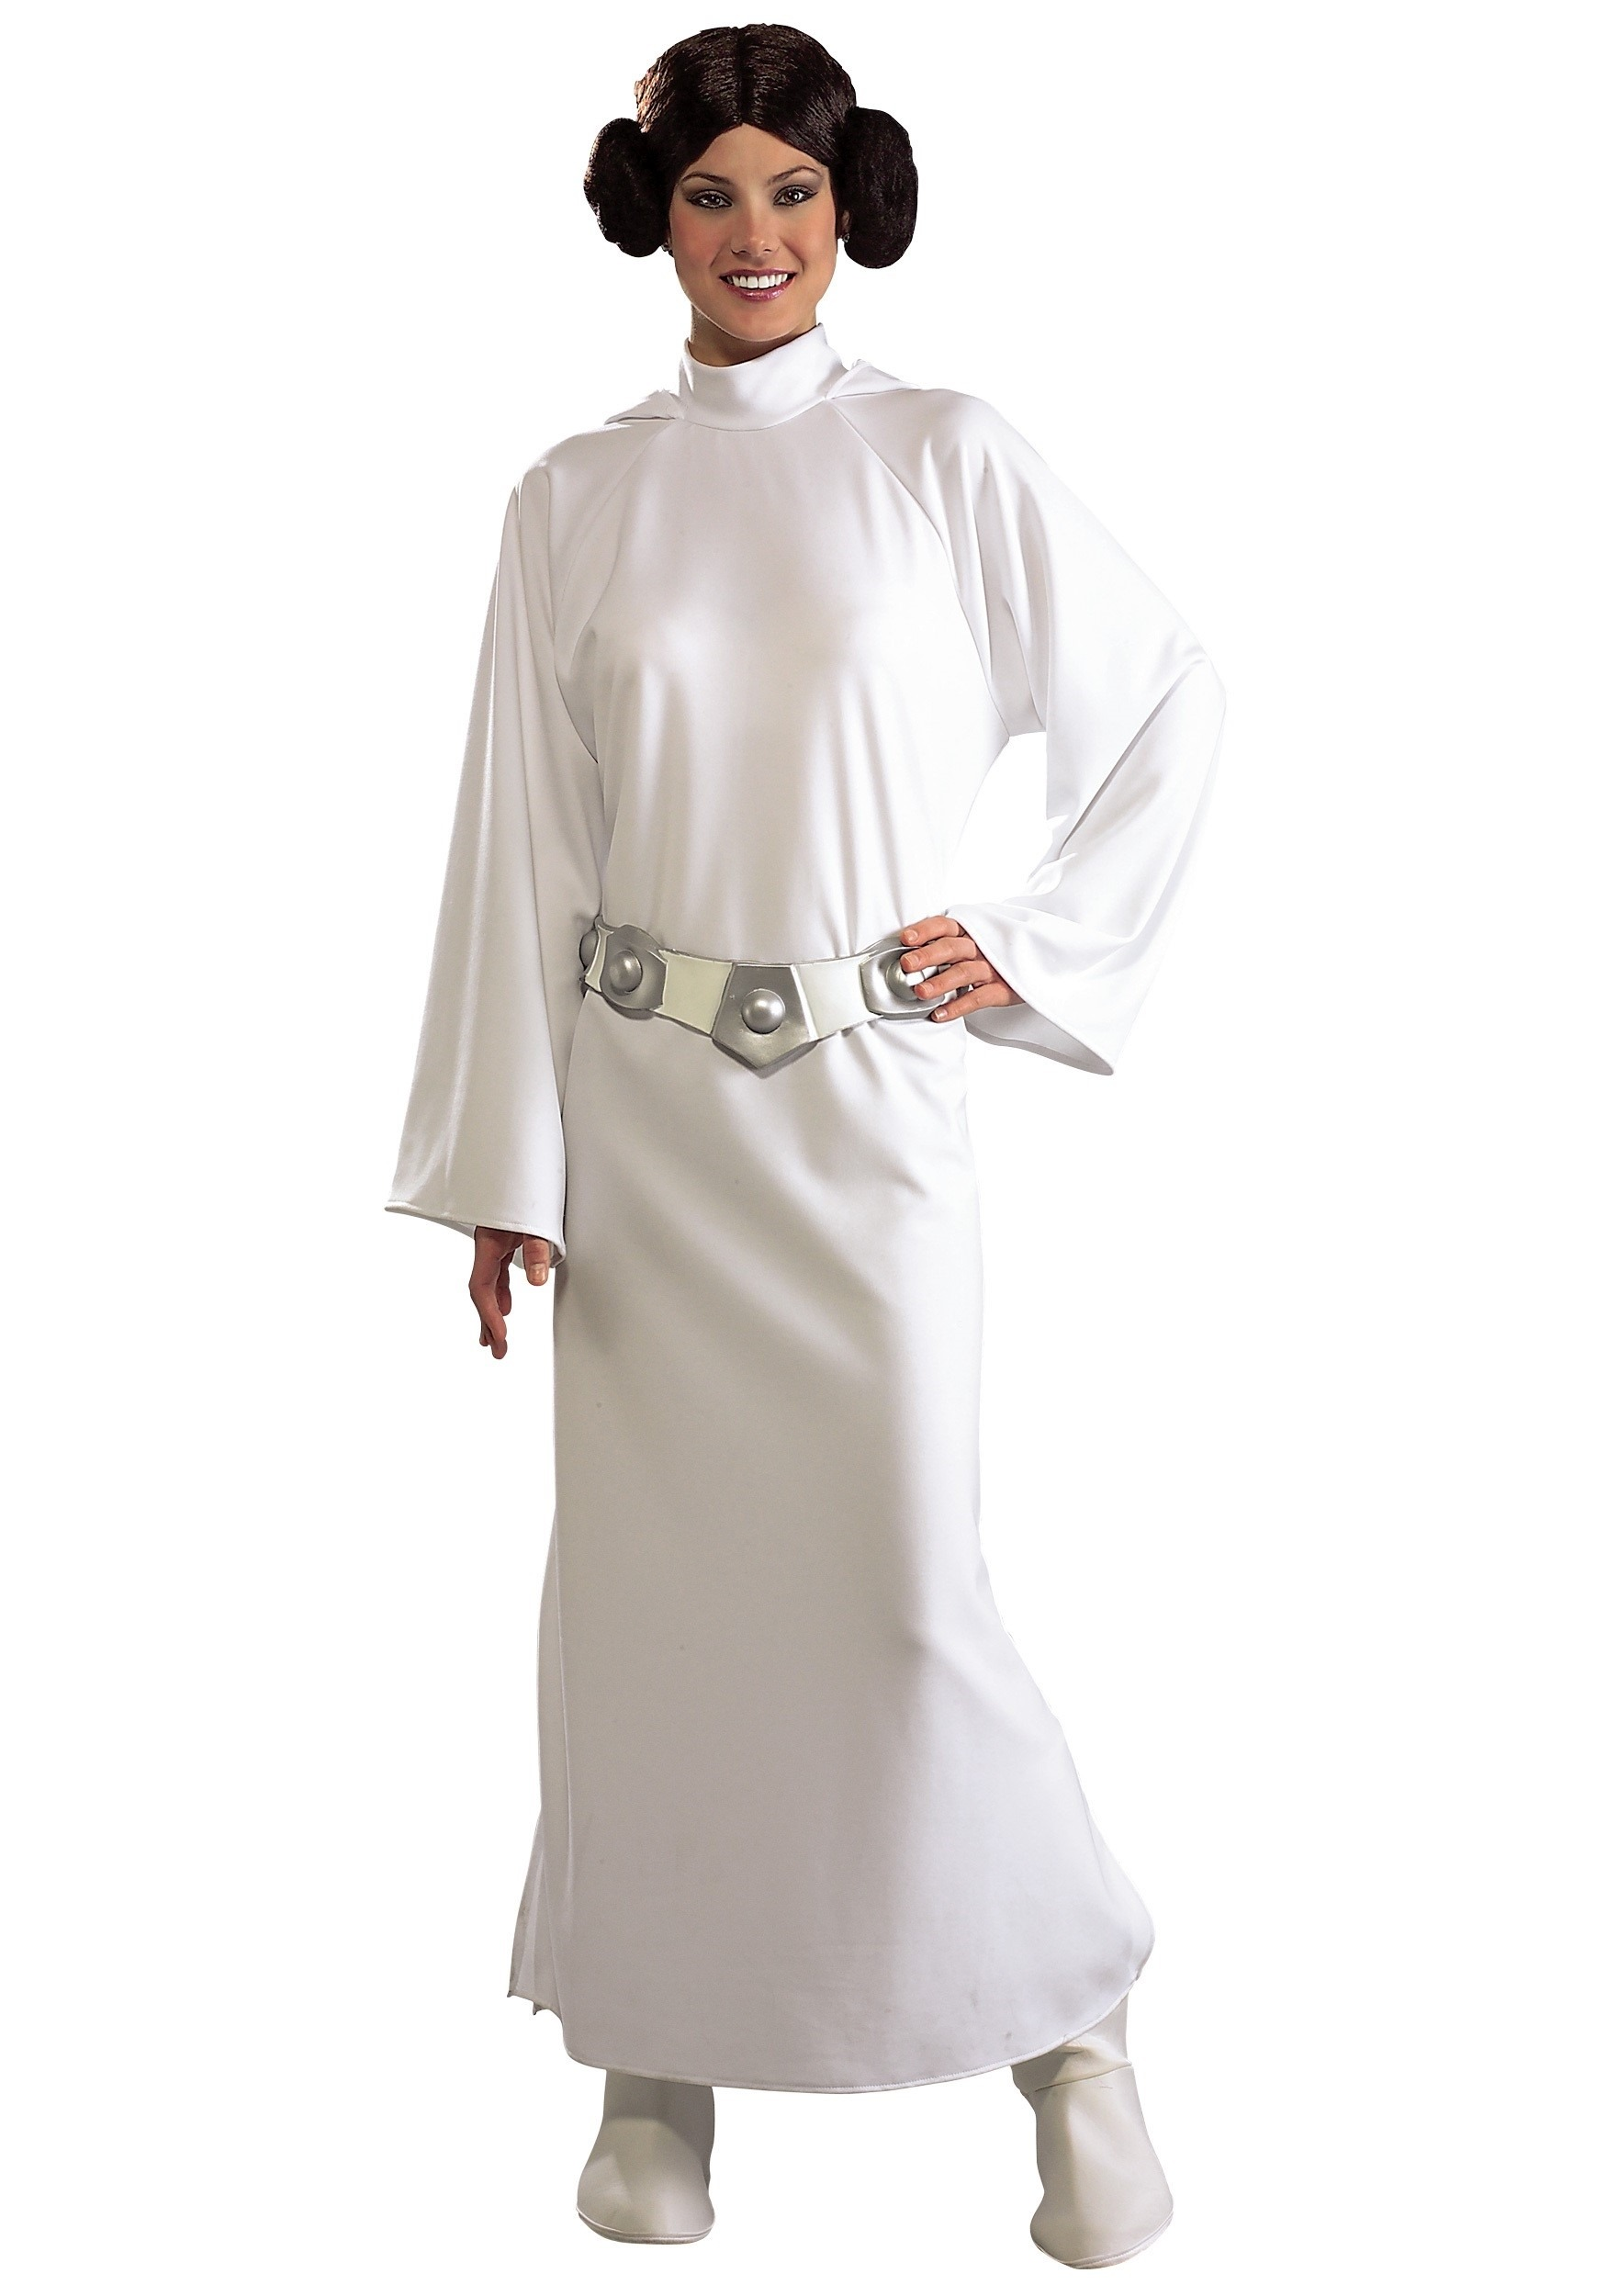 women 39 s princess leia costume. Black Bedroom Furniture Sets. Home Design Ideas